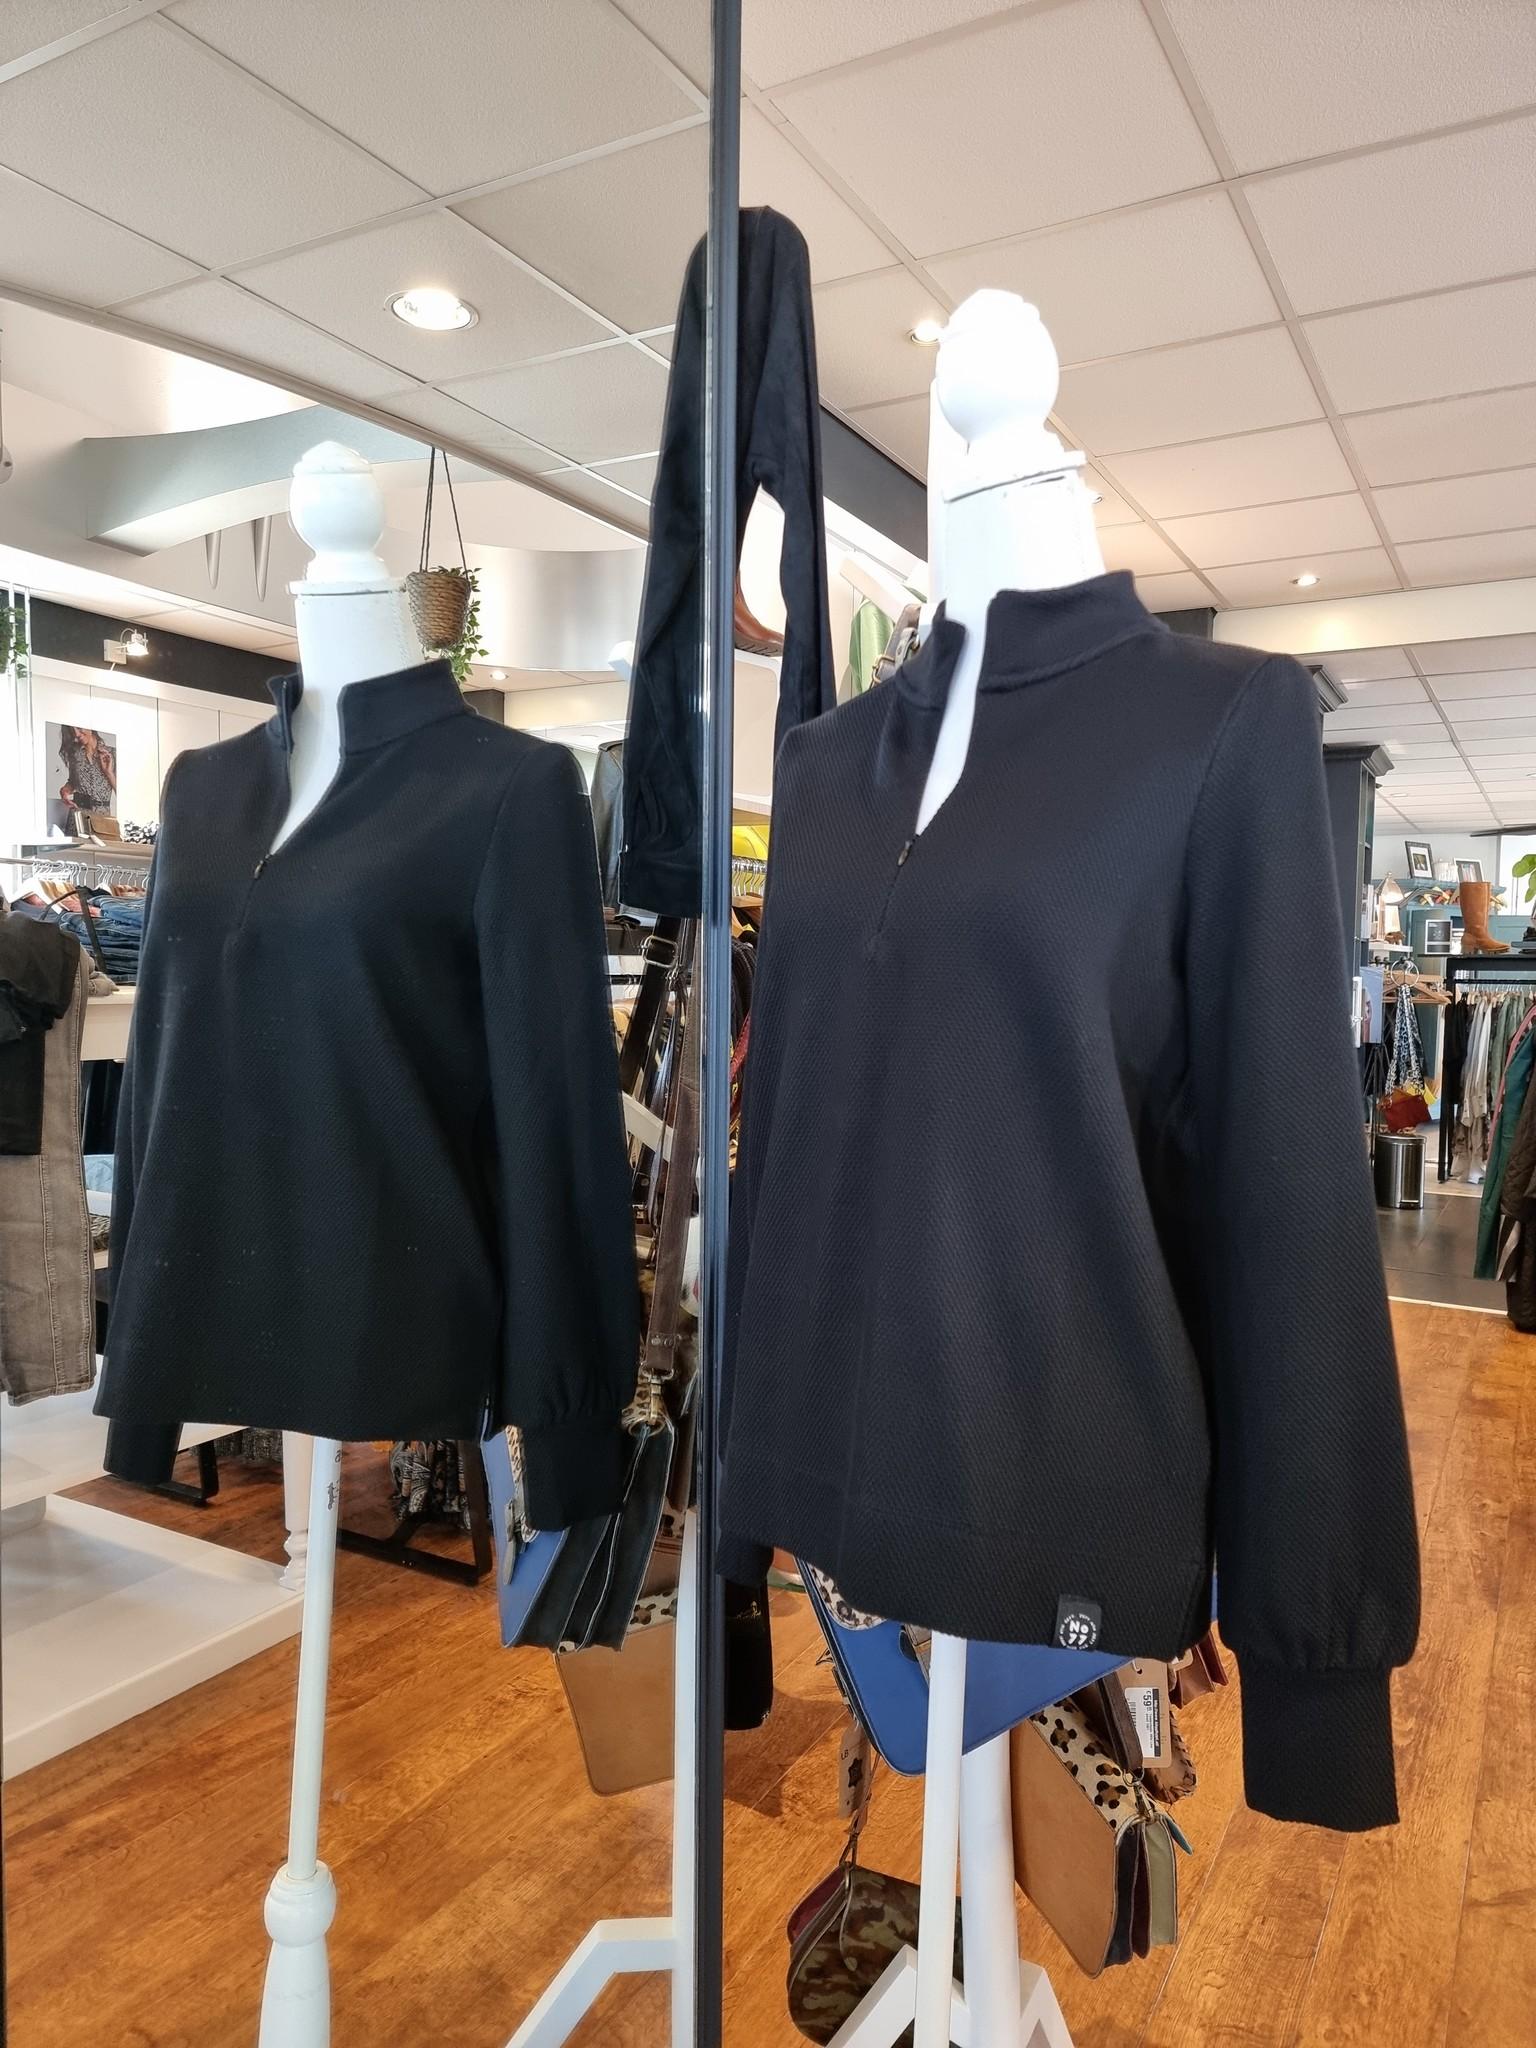 Zoso Zoso 215 Carmen Fantasy fabric sweater black